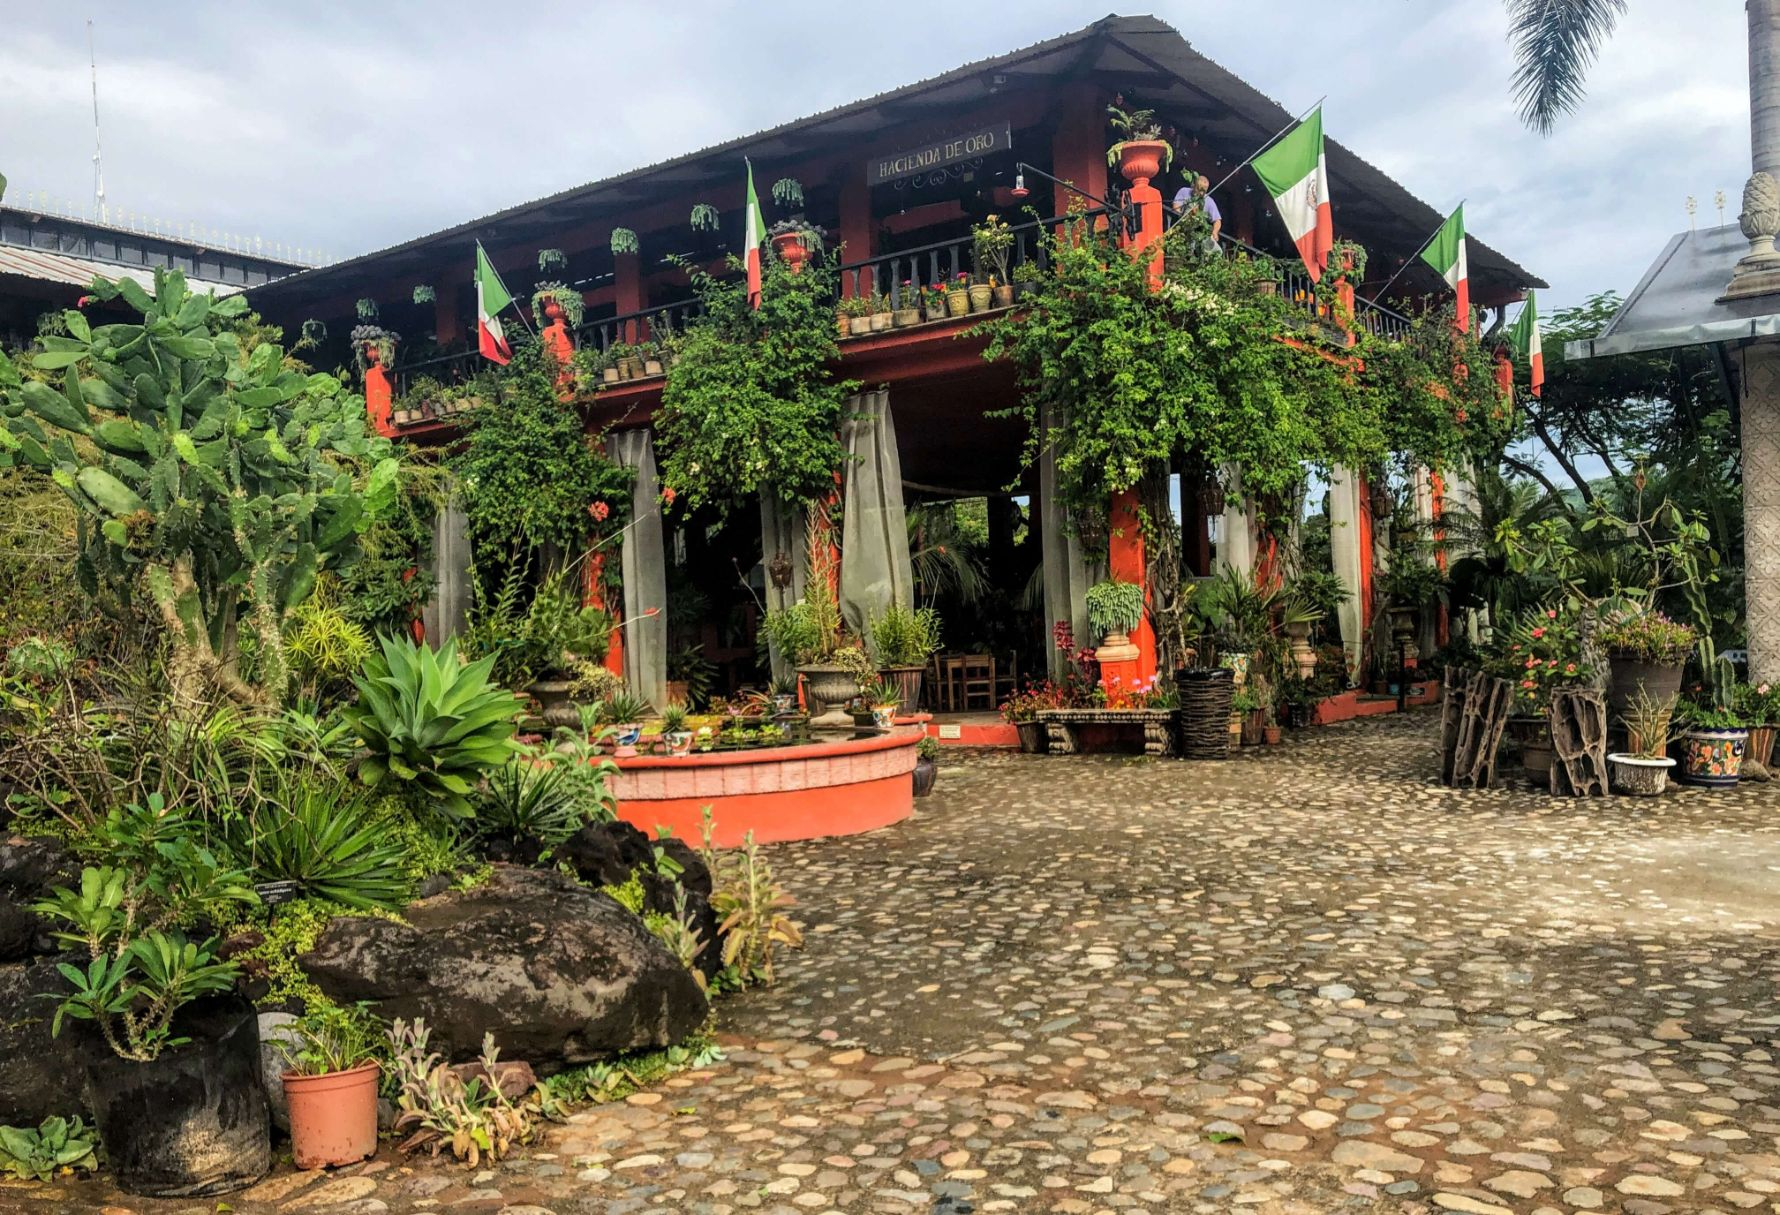 Hacienda del Oro restaurant